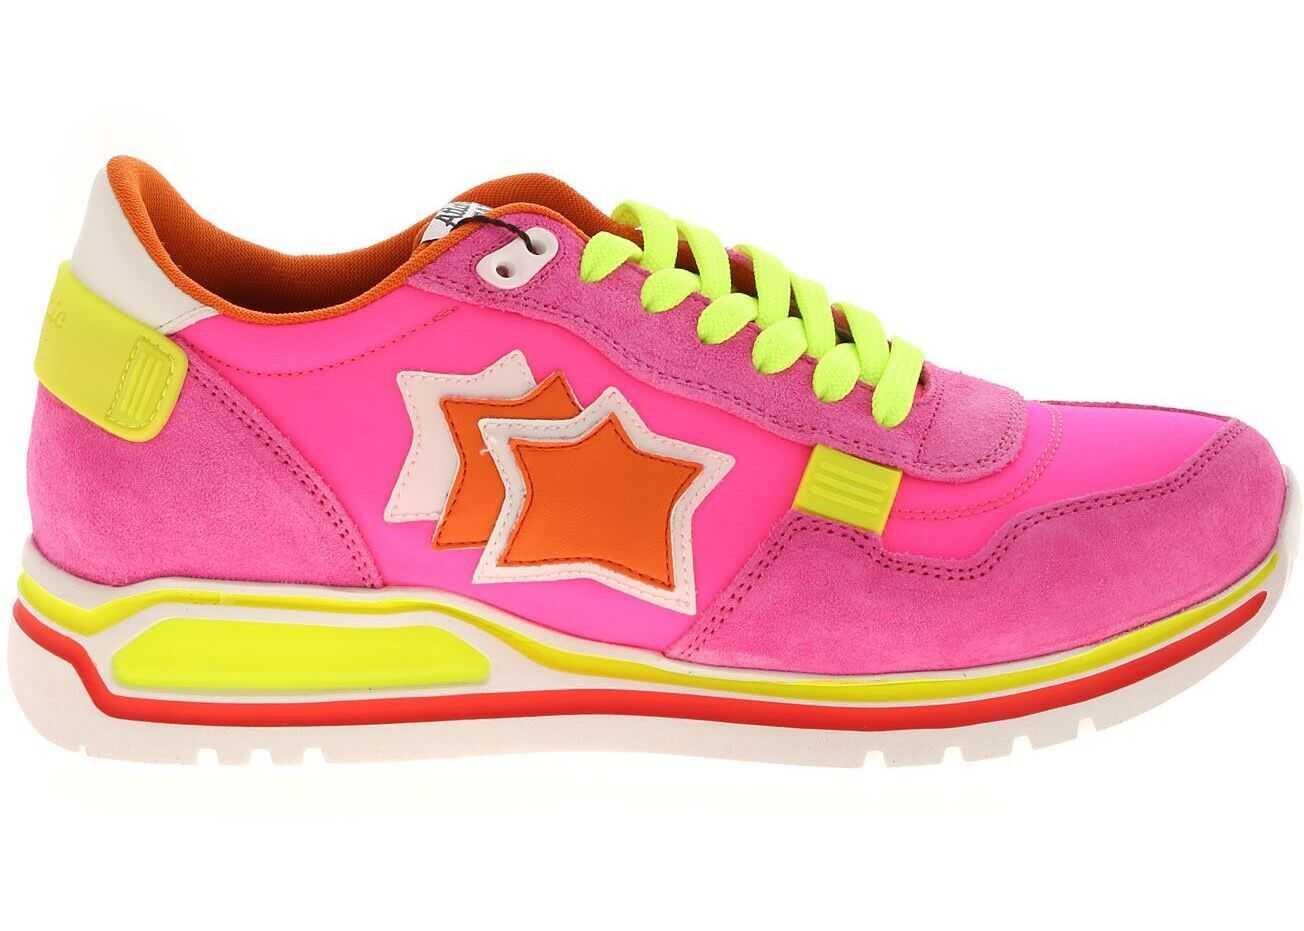 Atlantic Stars Shaka Sneakers In Fuchsia And Neon Yellow Fuchsia